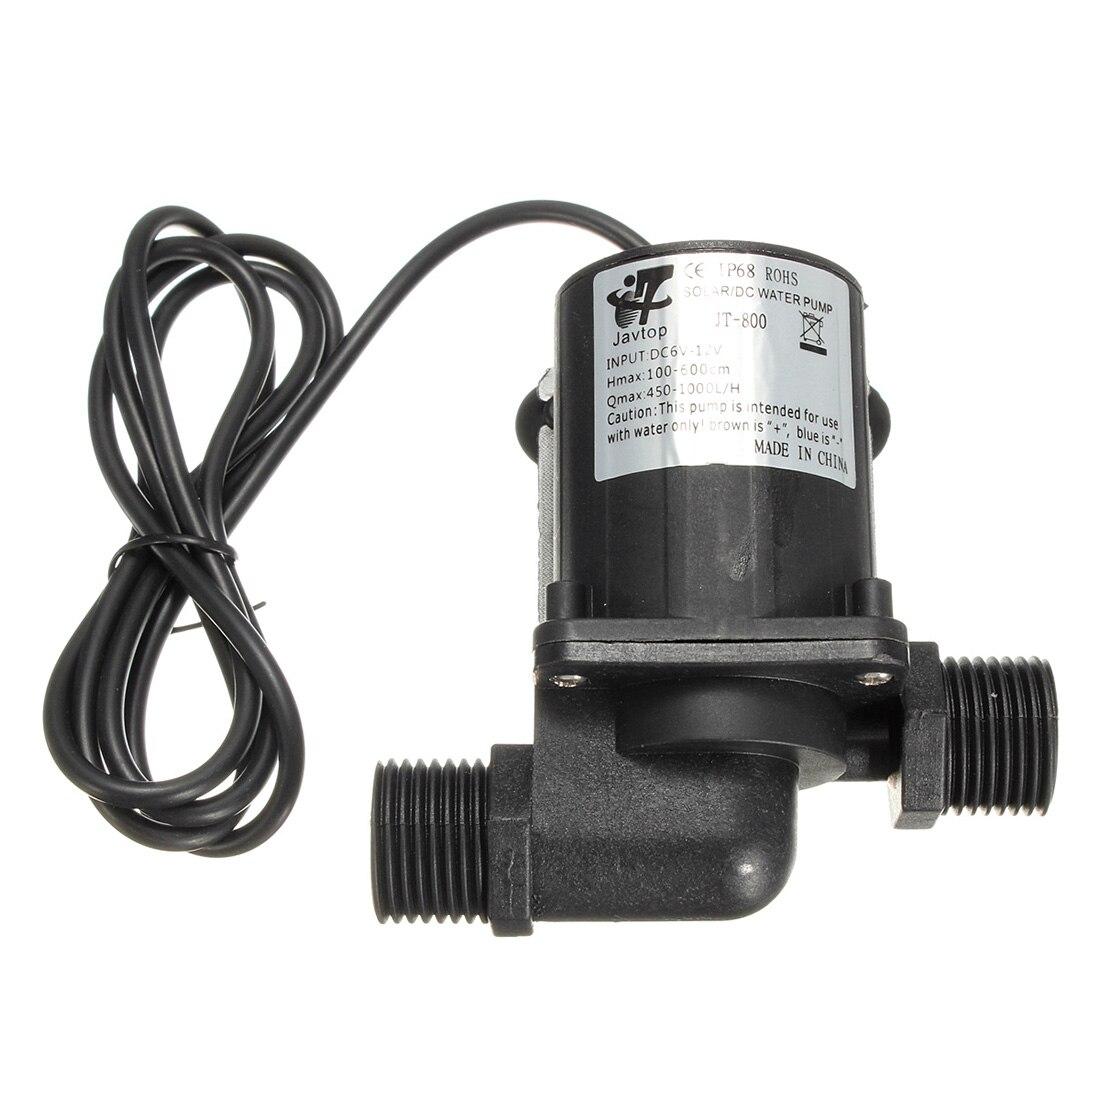 1000 l h aquarium fish tank powerhead jp 023 - Wholesale 5pcs Dc 12v Electric Solar Brushless Motor Water Pump Aquarium Fountain 1000l